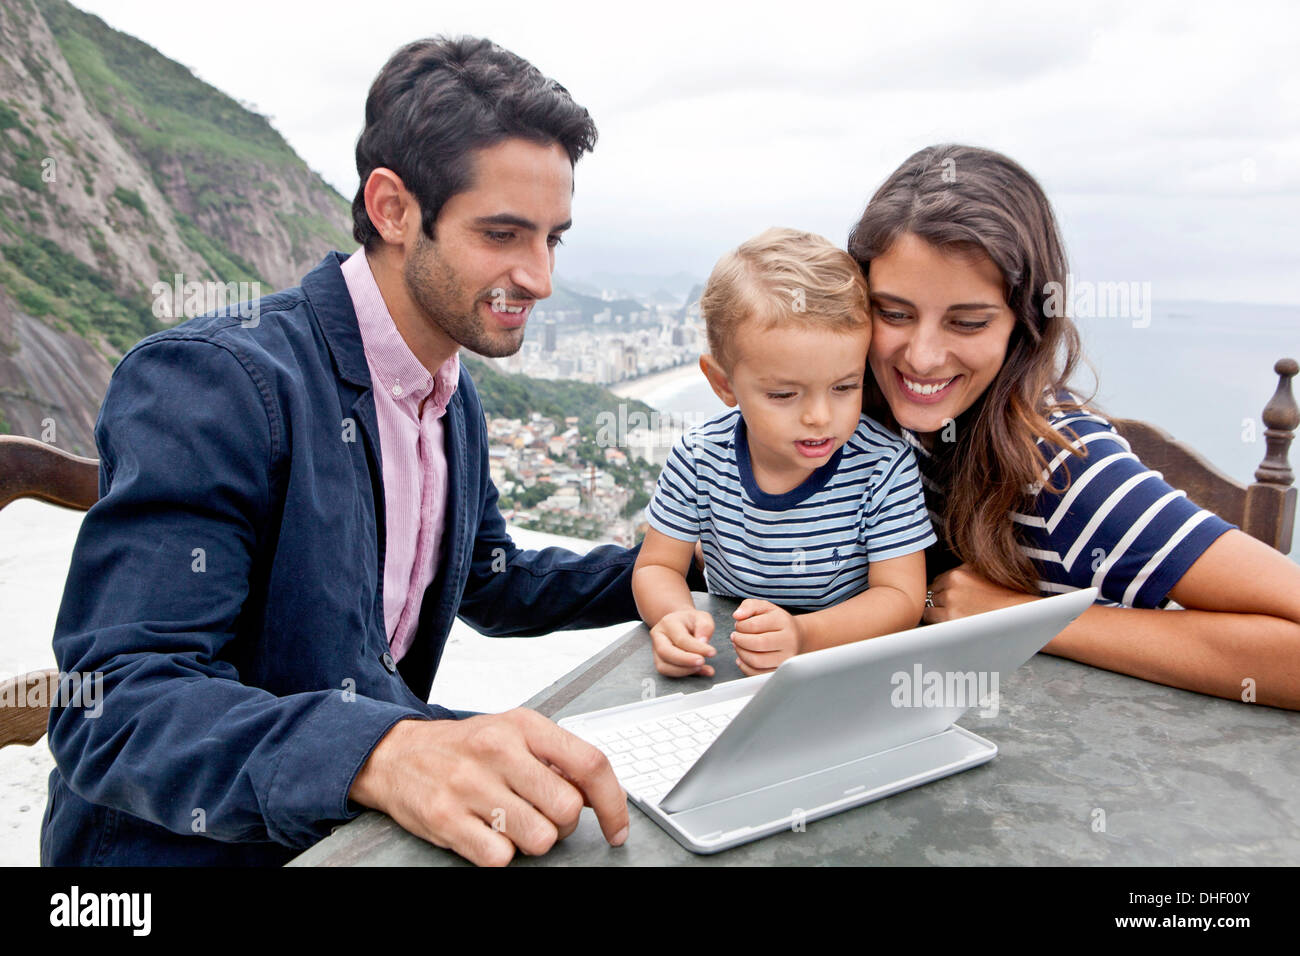 Famiglia giovane con laptop, Casa Alto Vidigal, Rio de Janeiro, Brasile Immagini Stock